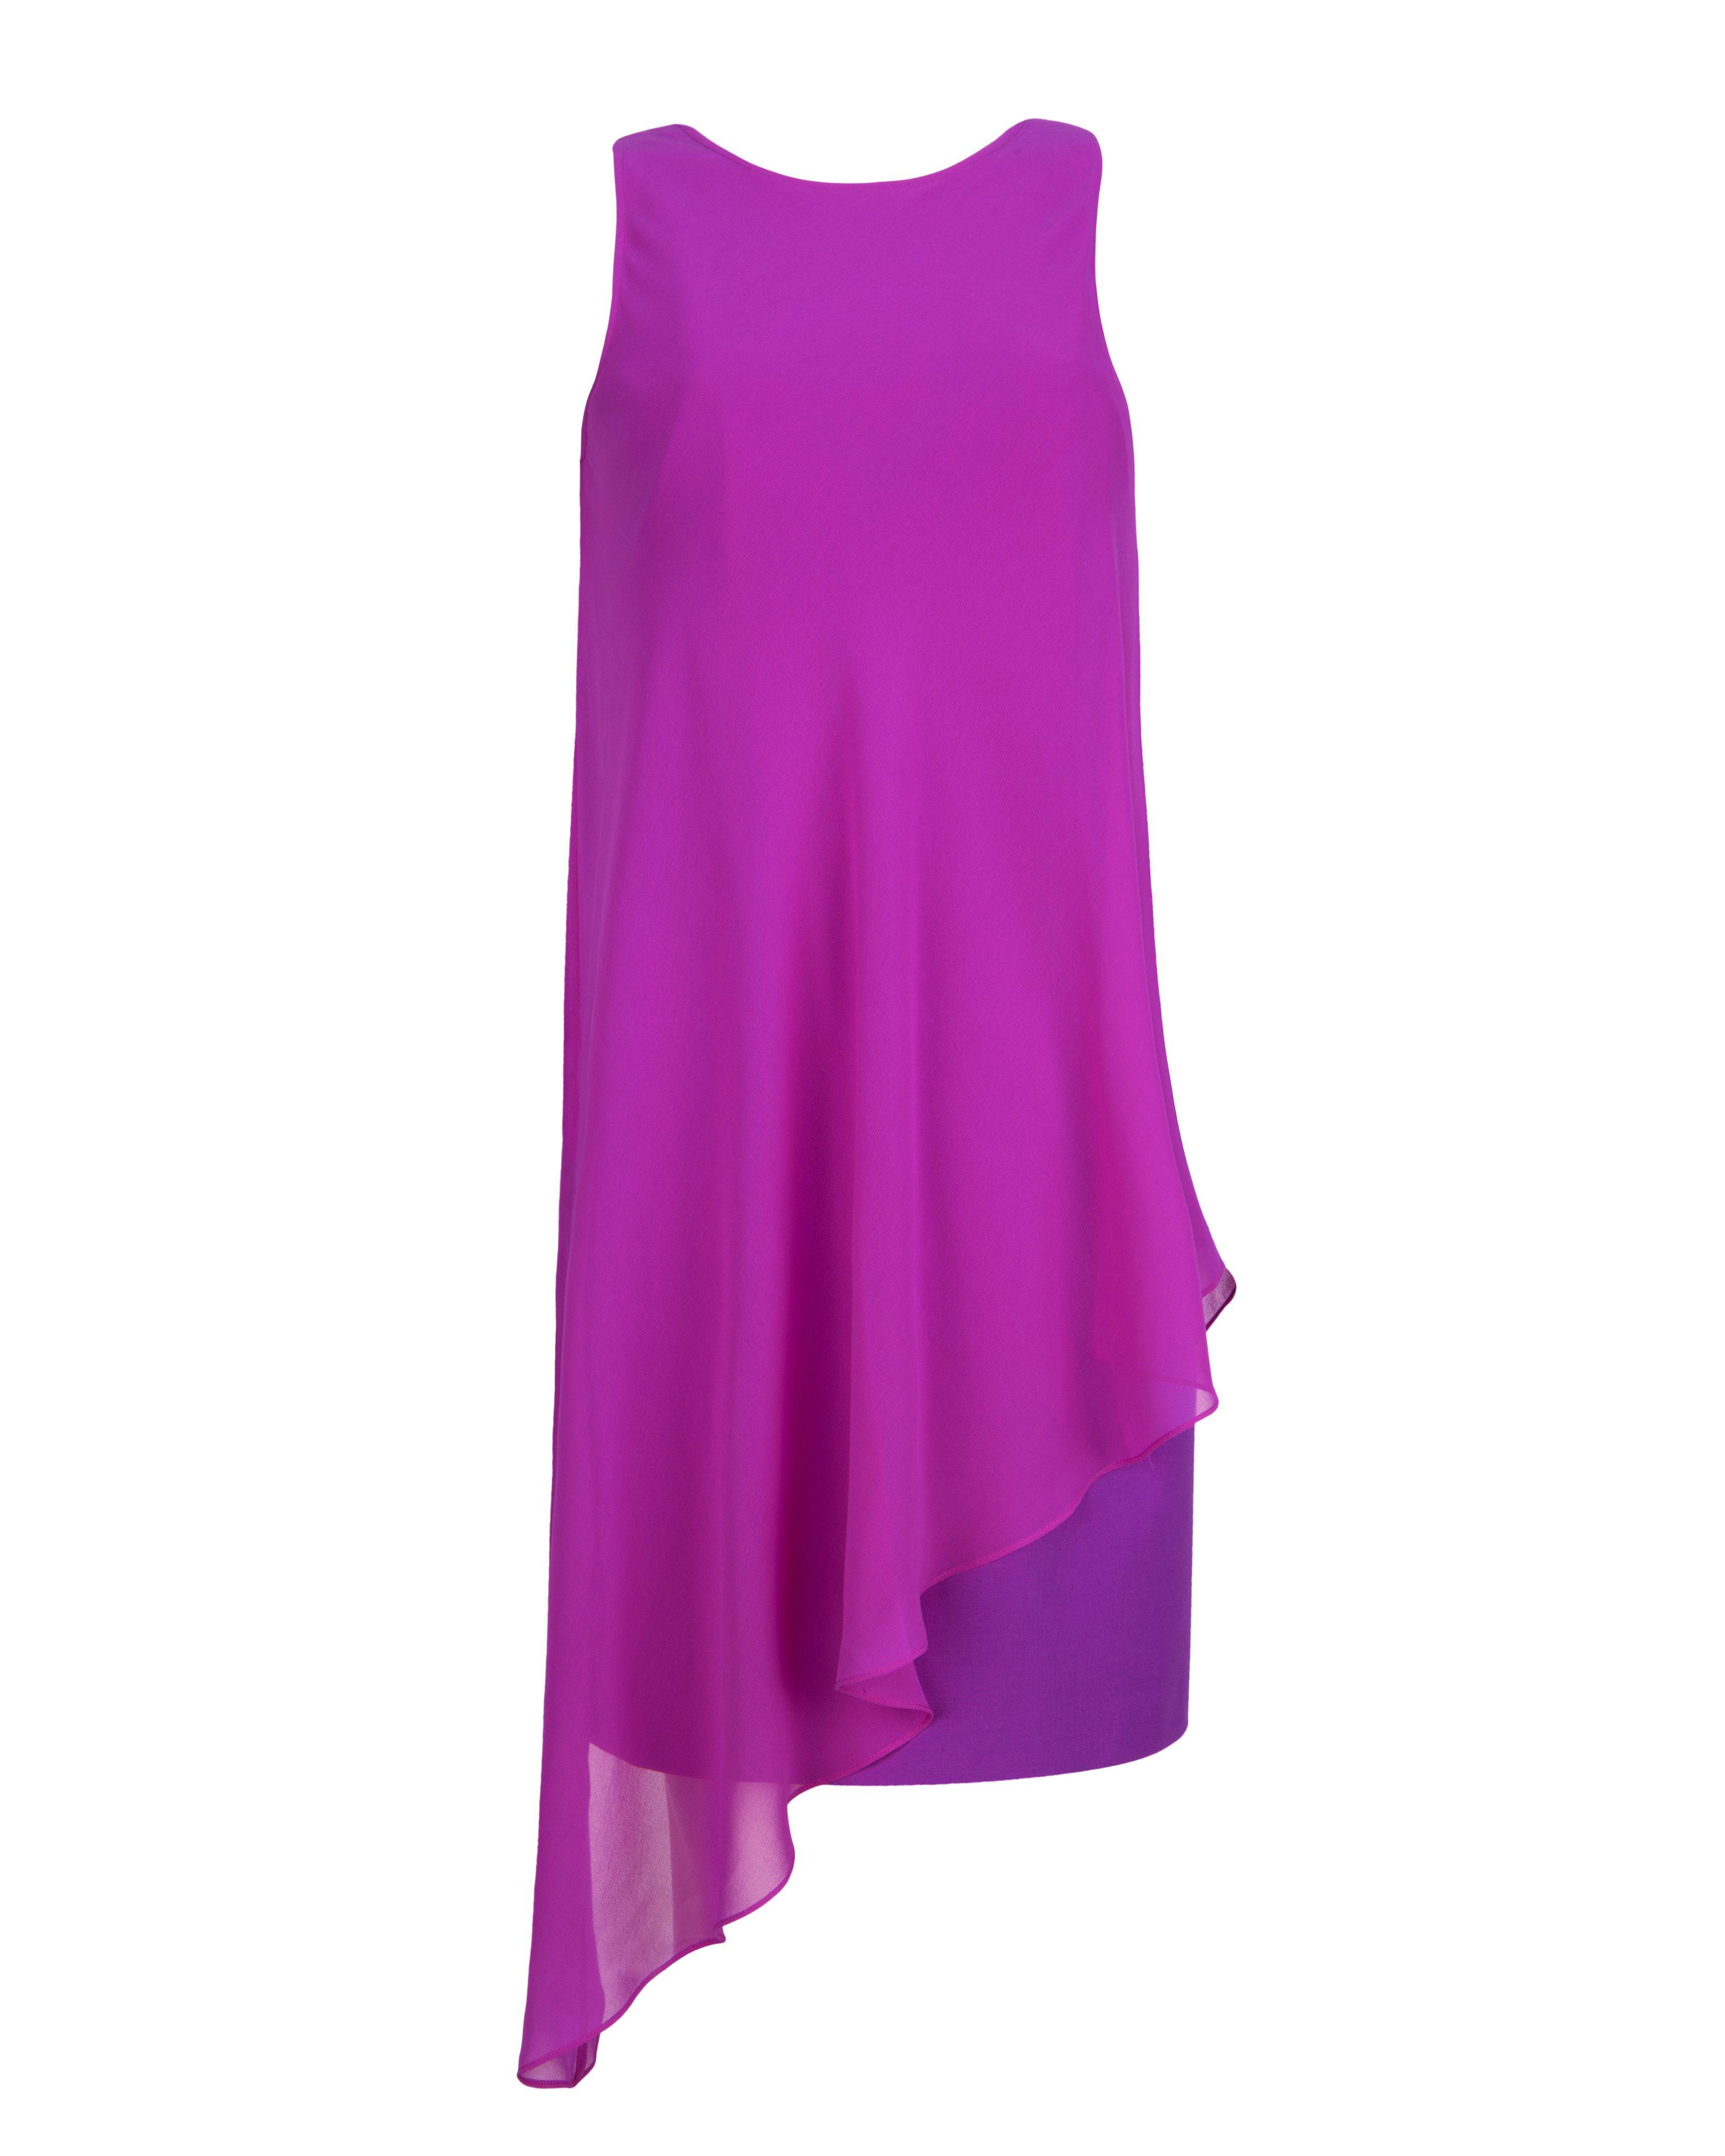 Asymmetric Drape Dress: Ted Baker Locie Asymmetric Drape Tunic Dress In Purple